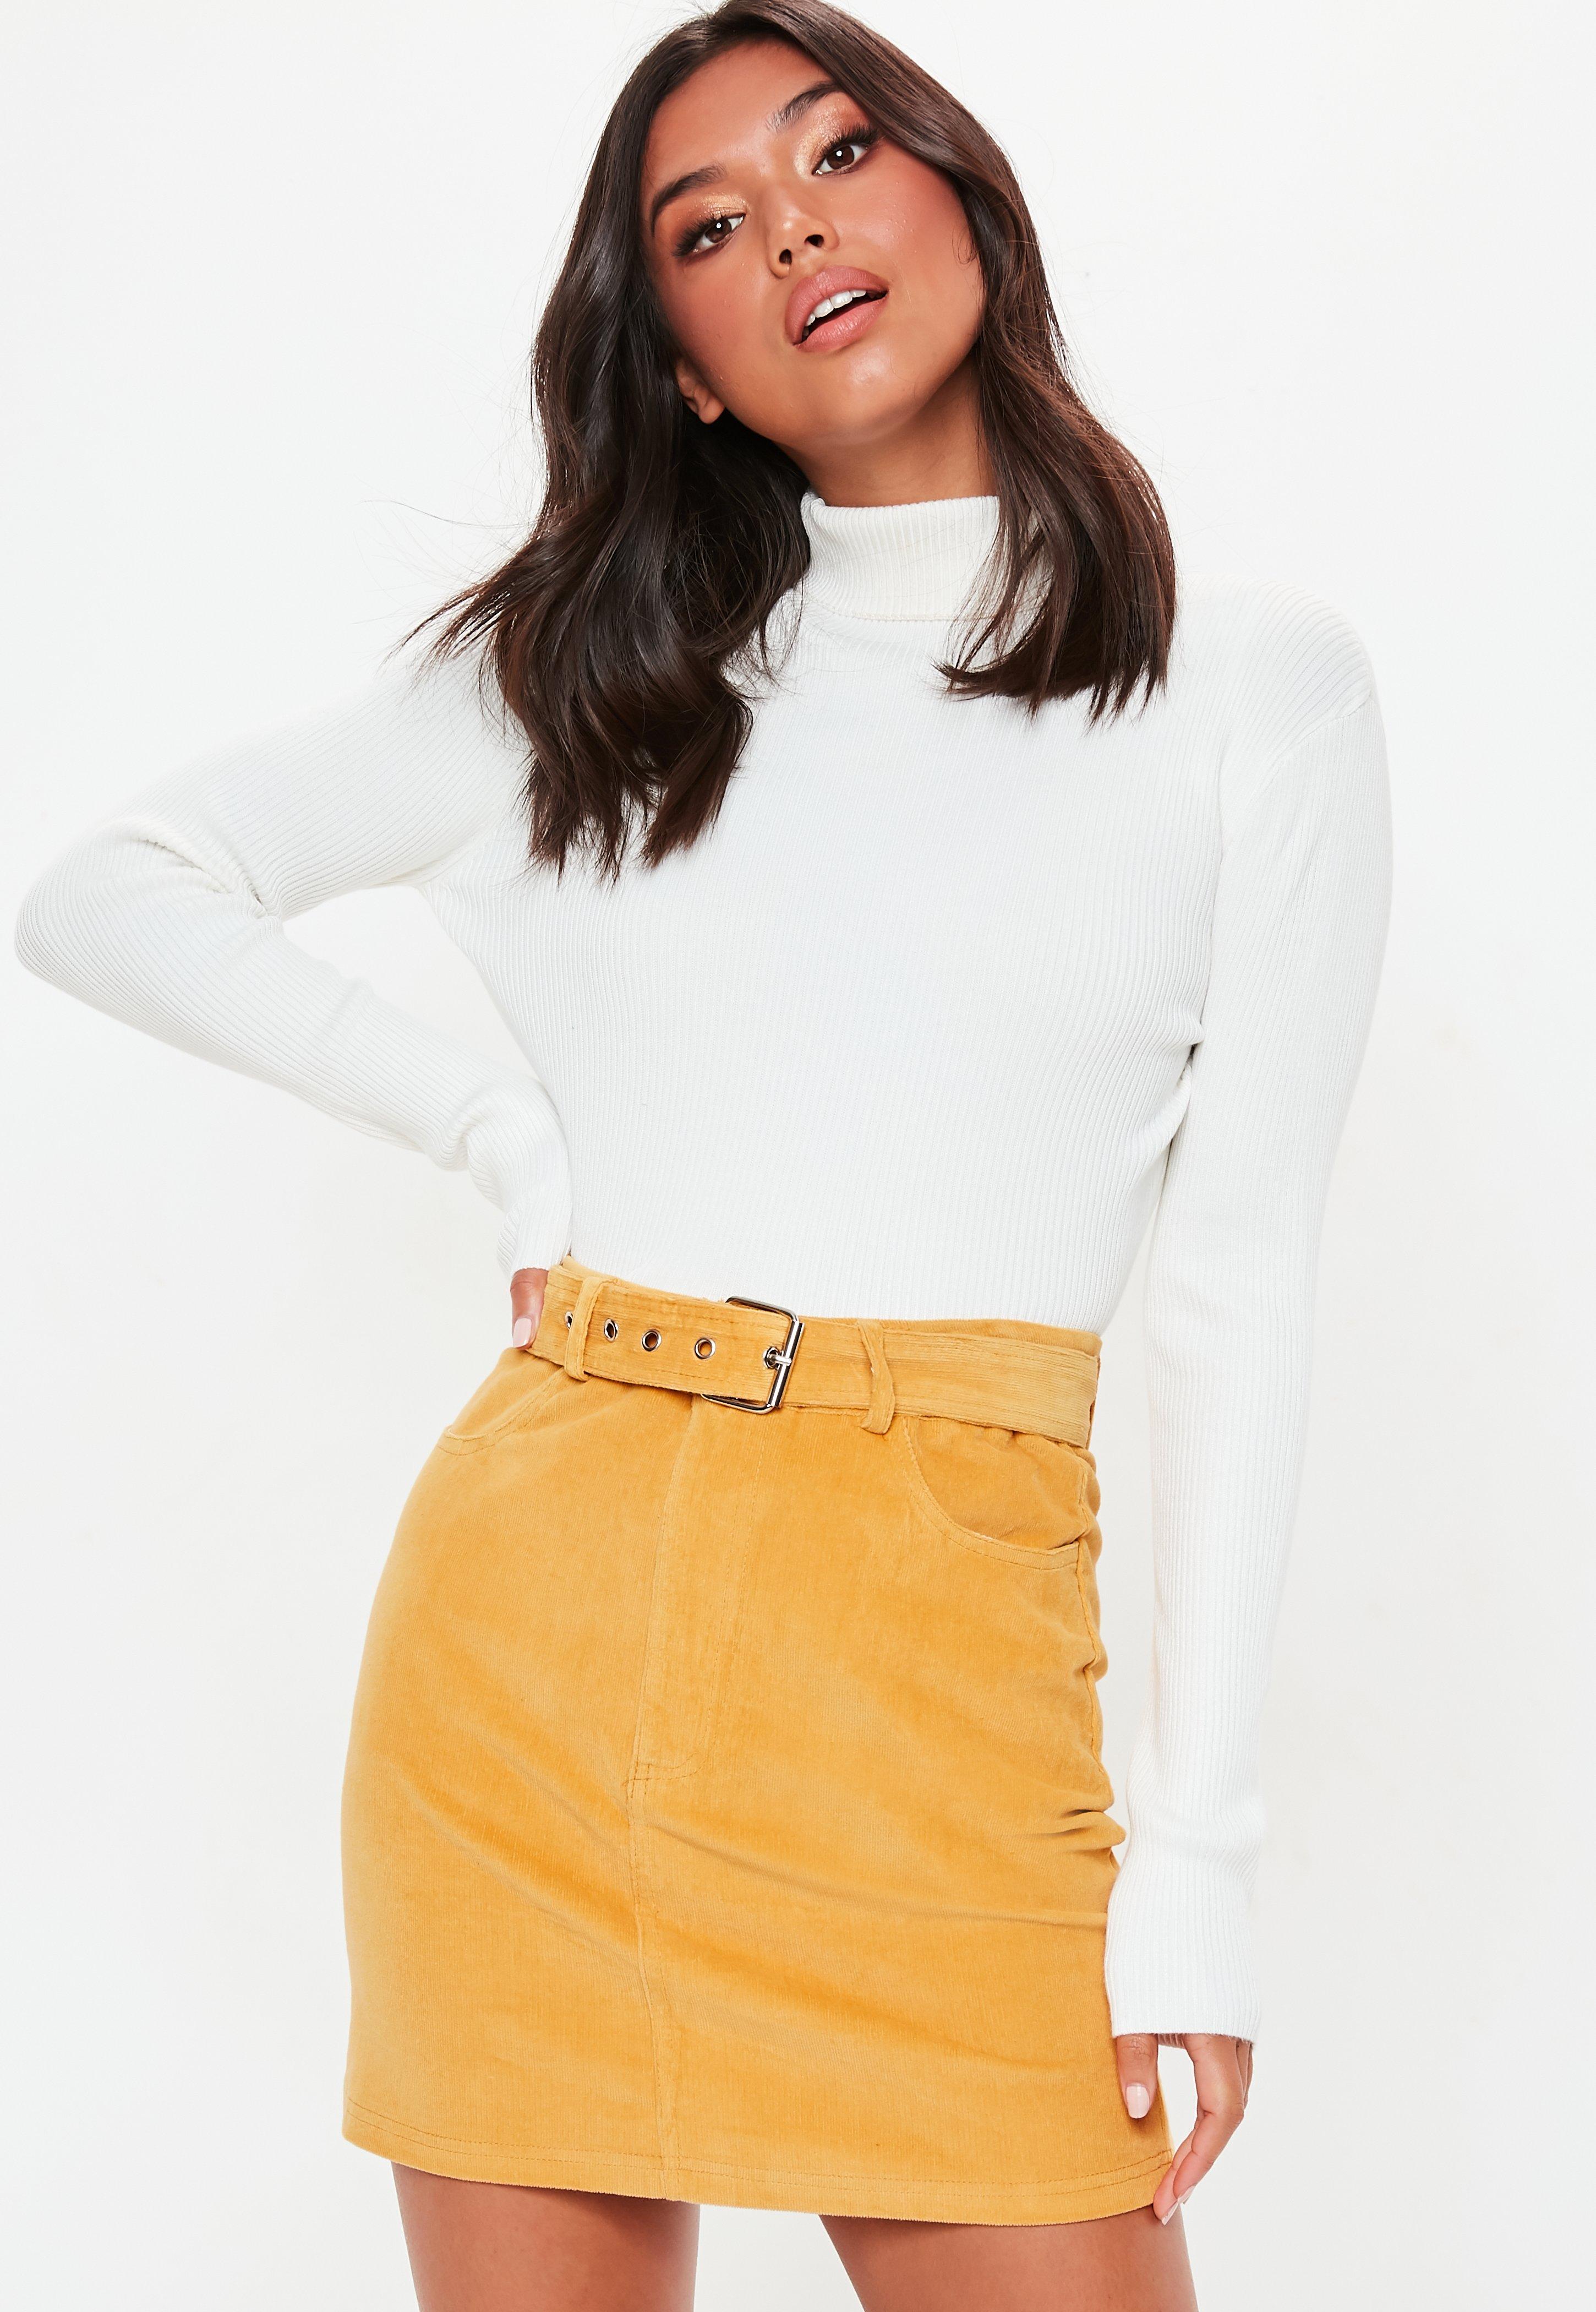 43f8dfdfa8a86d Mustard Corduroy Buckle Detail Mini Skirt | Missguided Ireland